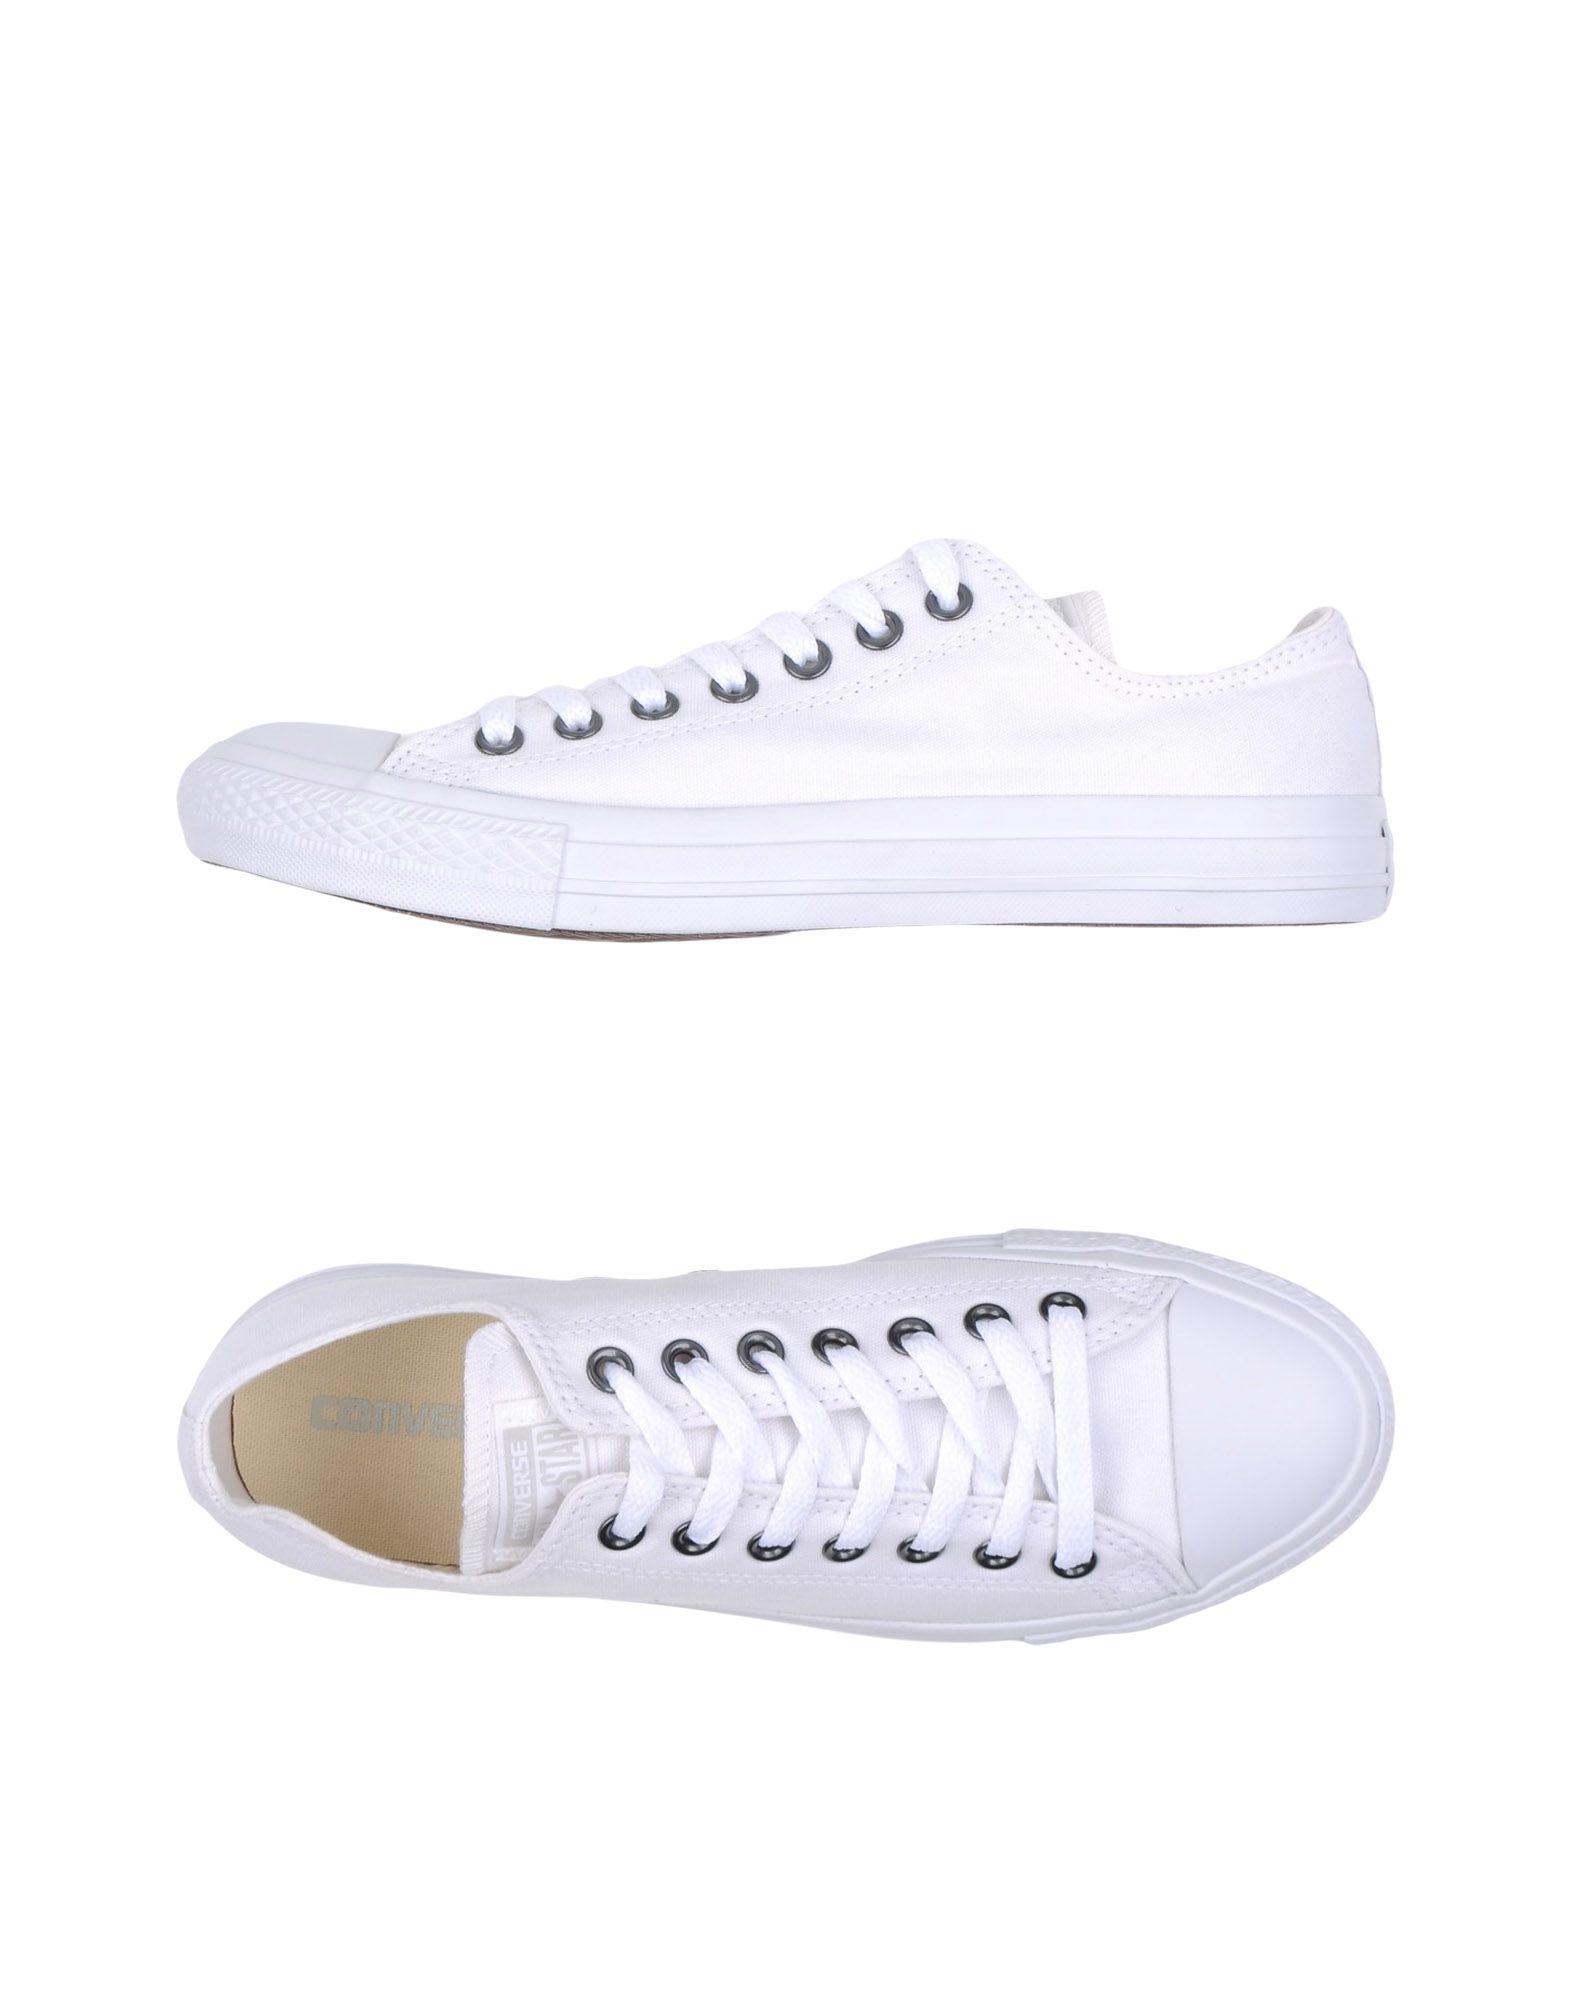 Rabatt echte Schuhe Converse All Star Sneakers Herren  11180936HH